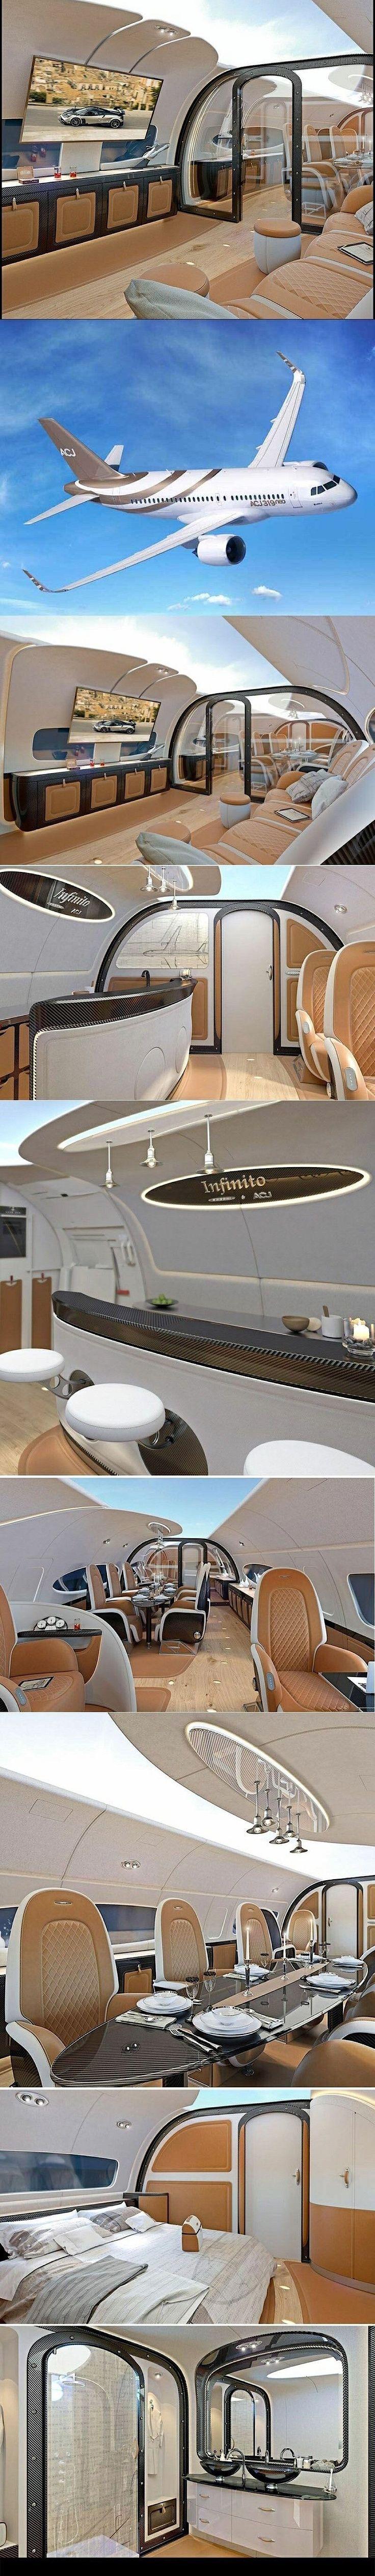 Private Jet ✈️ Interior Panoramic Tour